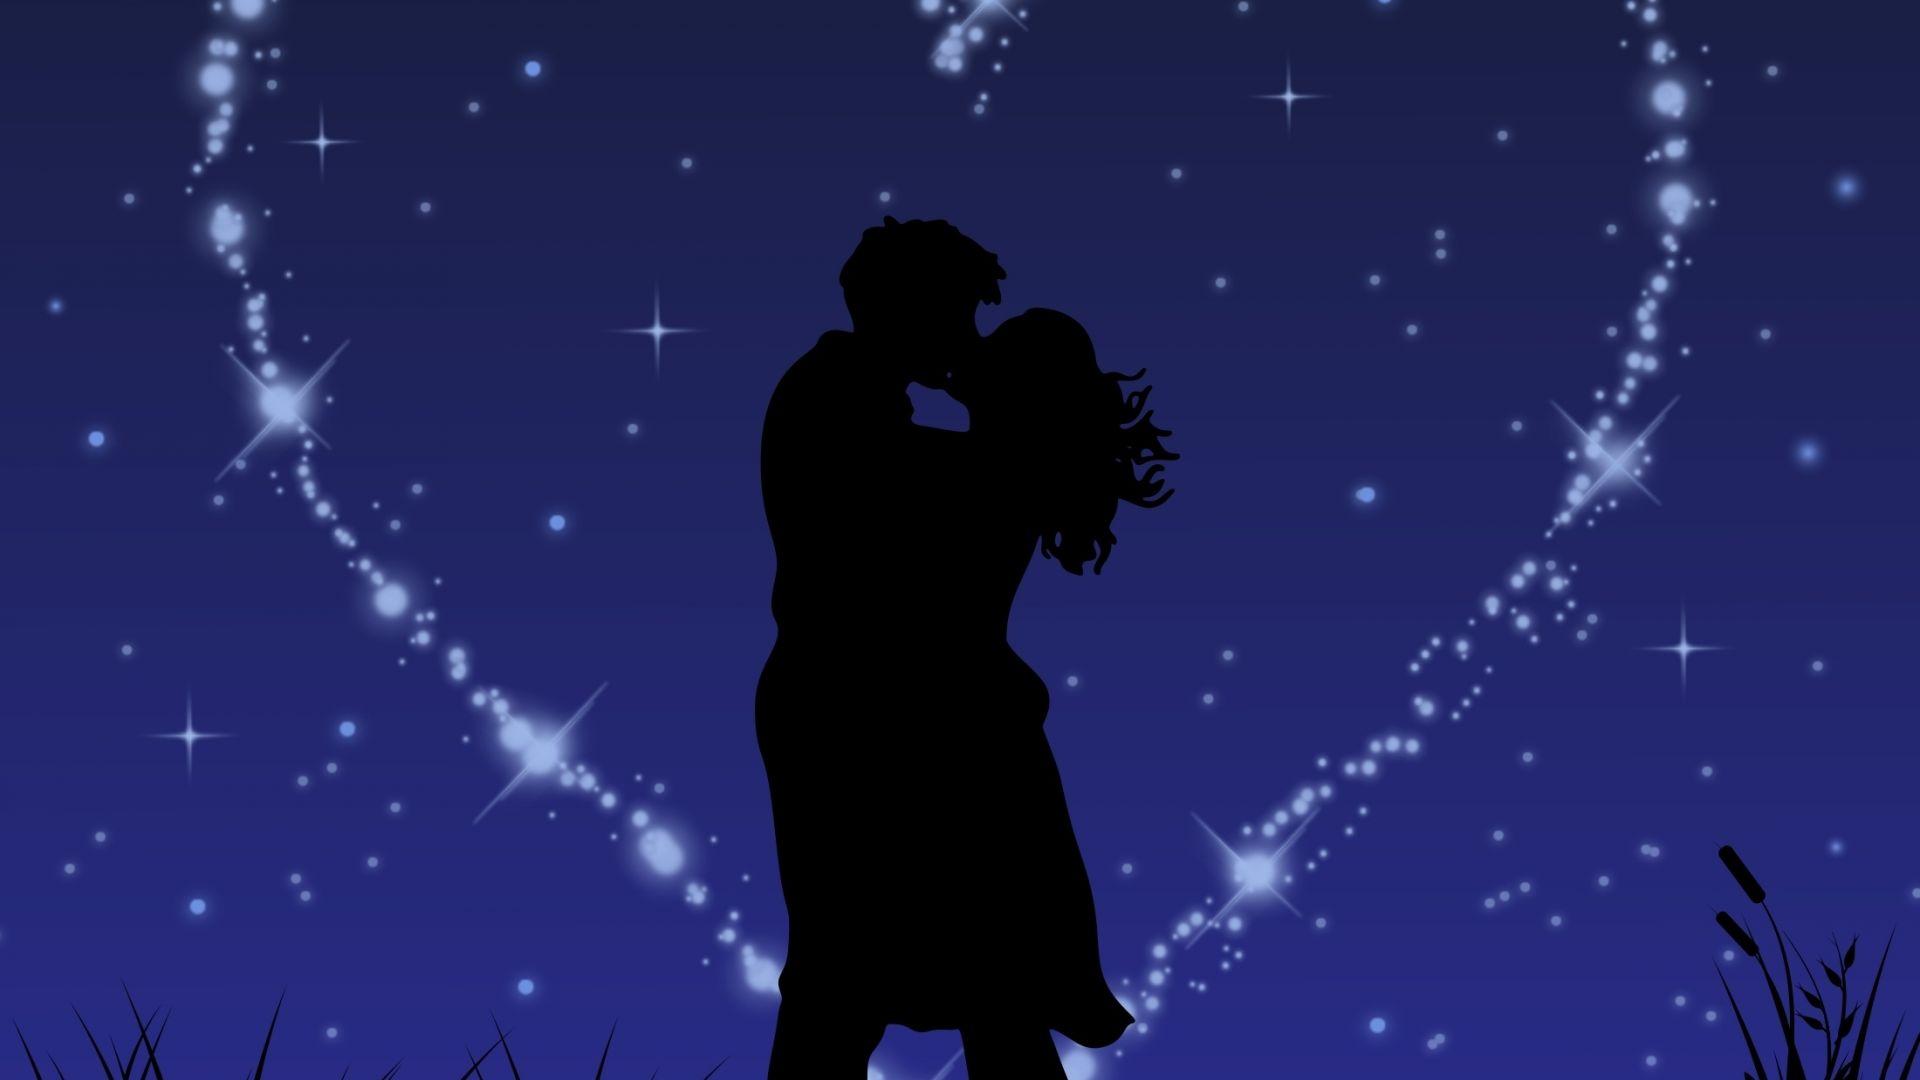 Wallpaper Couple, love, kiss, stars, glitter, digital art